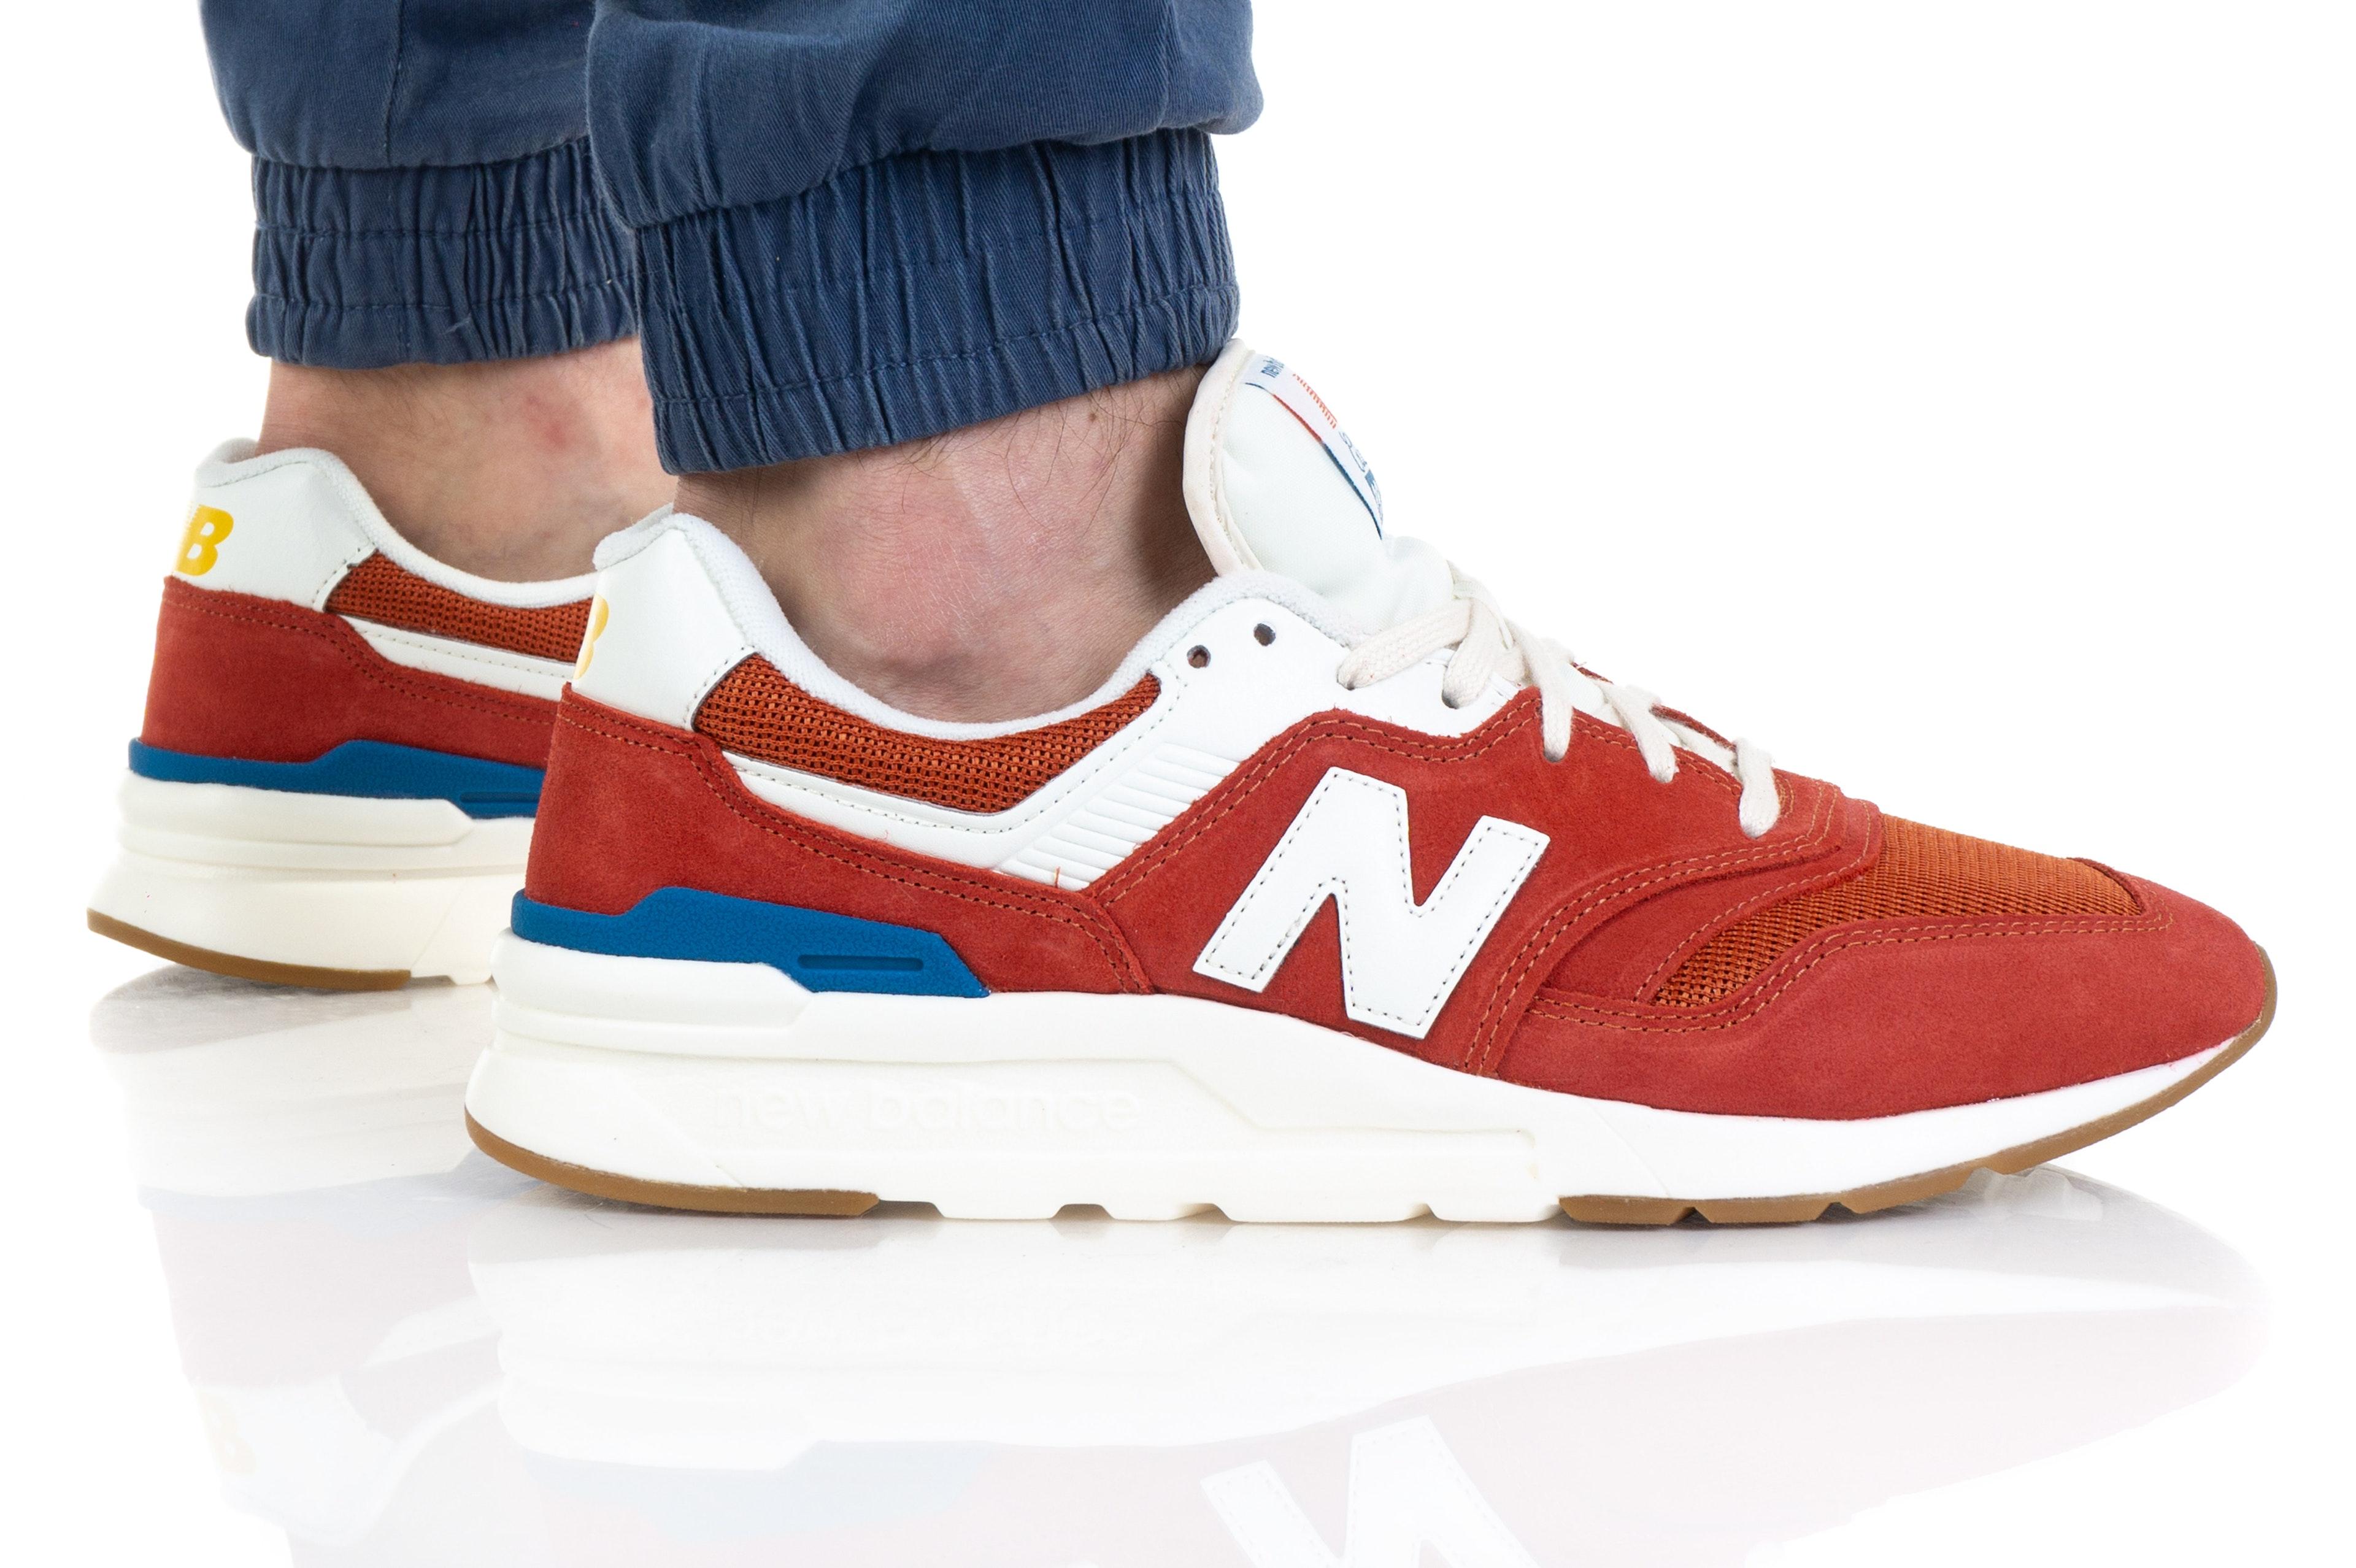 New Balance 997 CM997HRG